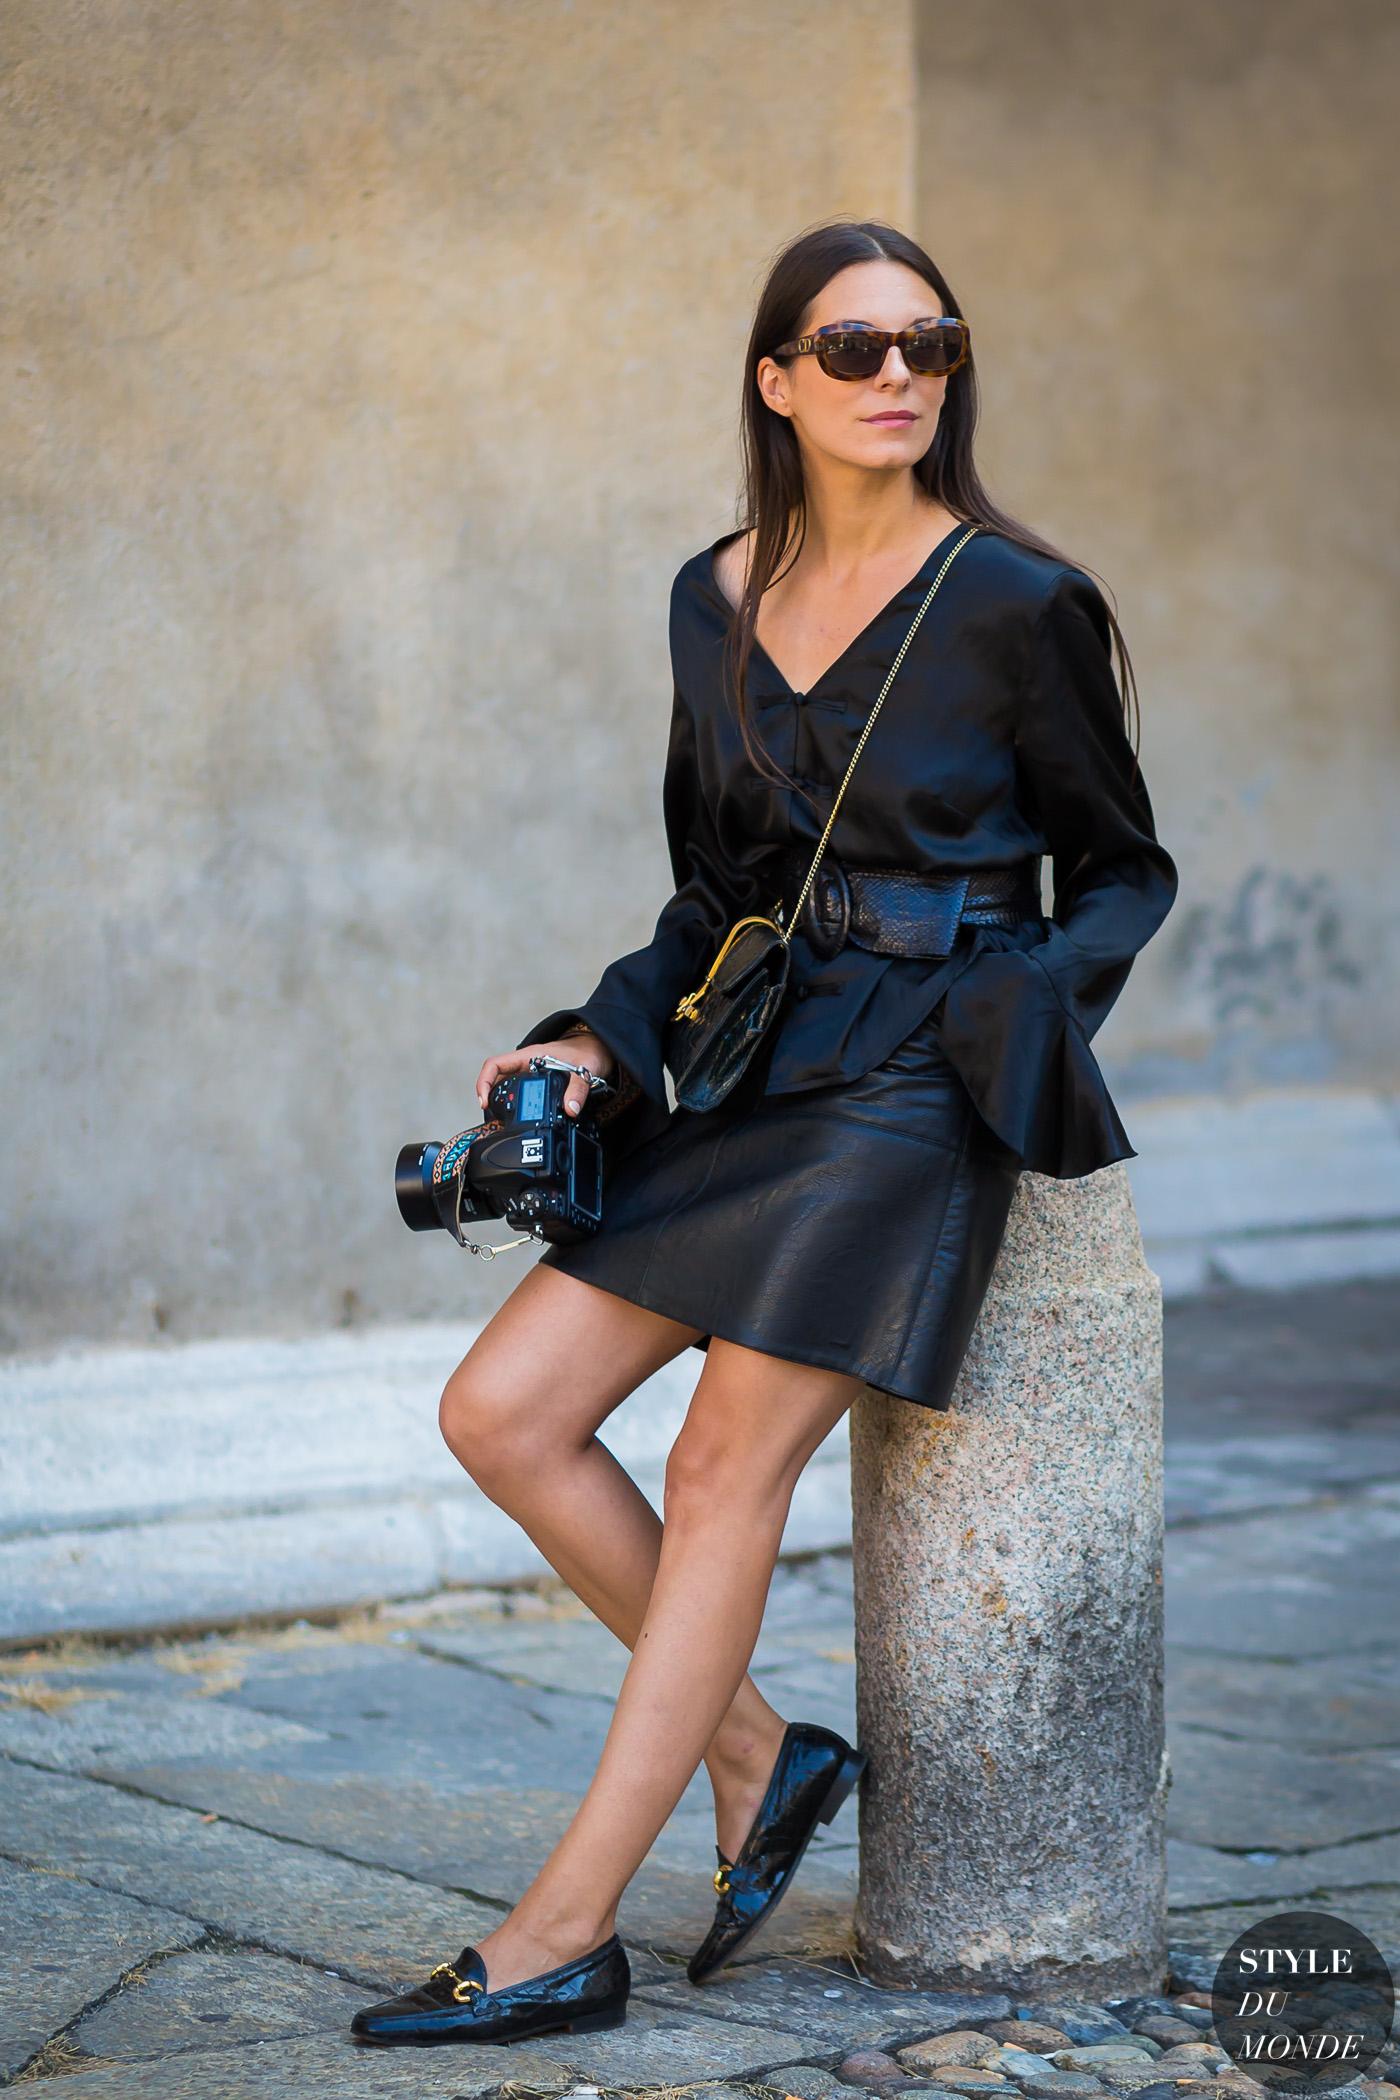 andreea-bogdan-by-styledumonde-street-style-fashion-photography